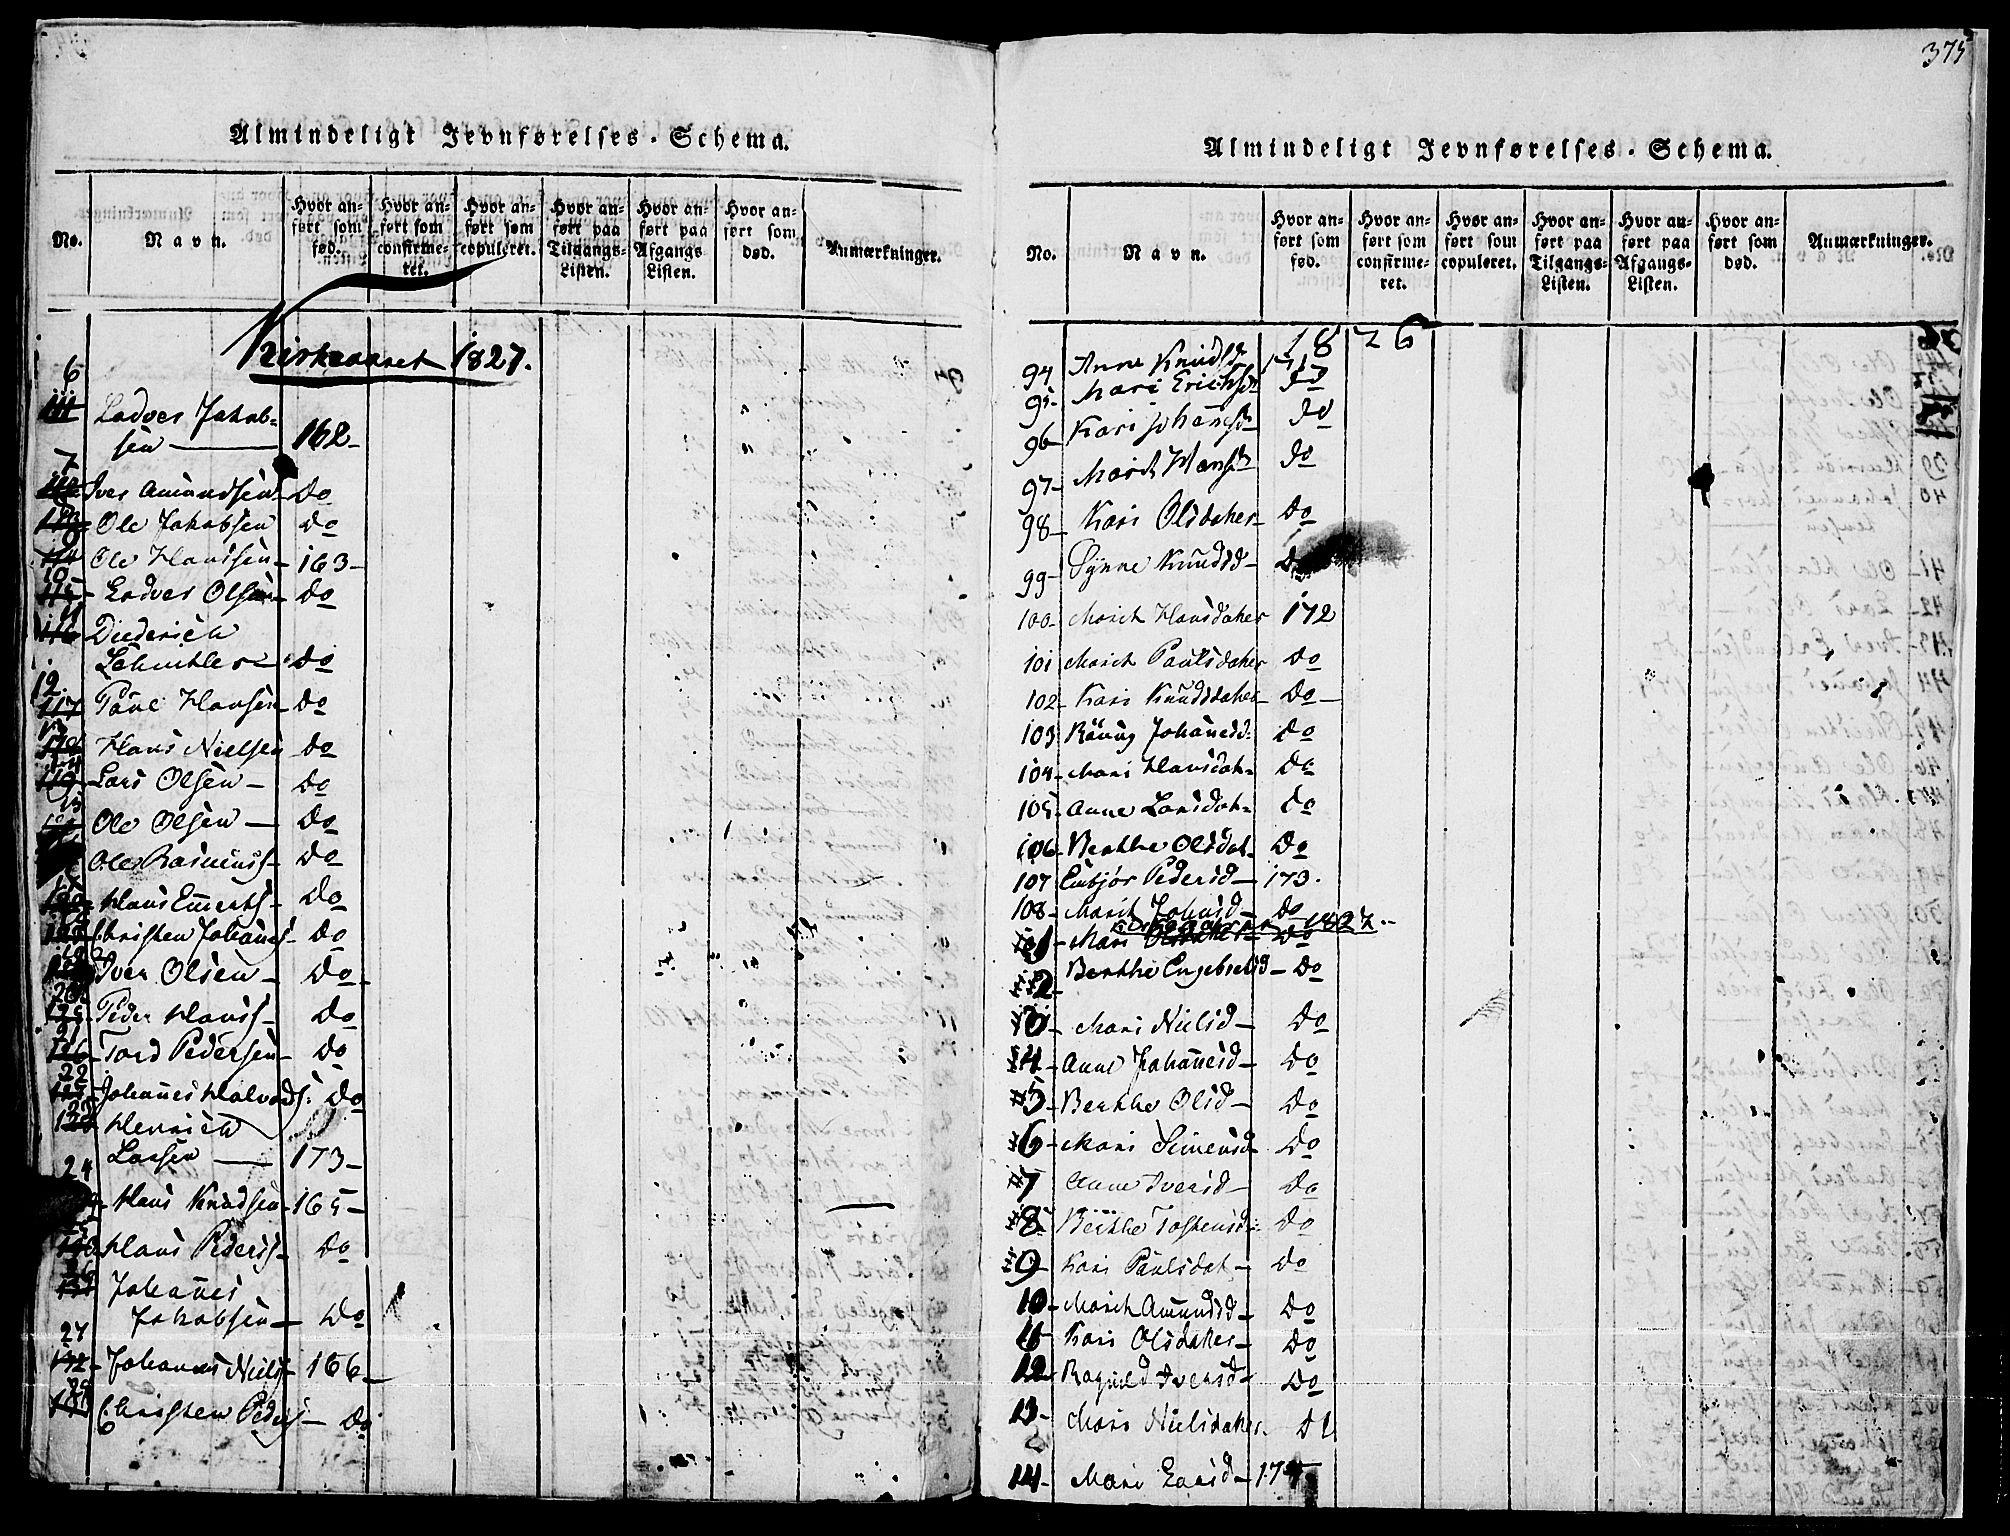 SAH, Fron prestekontor, H/Ha/Haa/L0002: Ministerialbok nr. 2, 1816-1827, s. 375